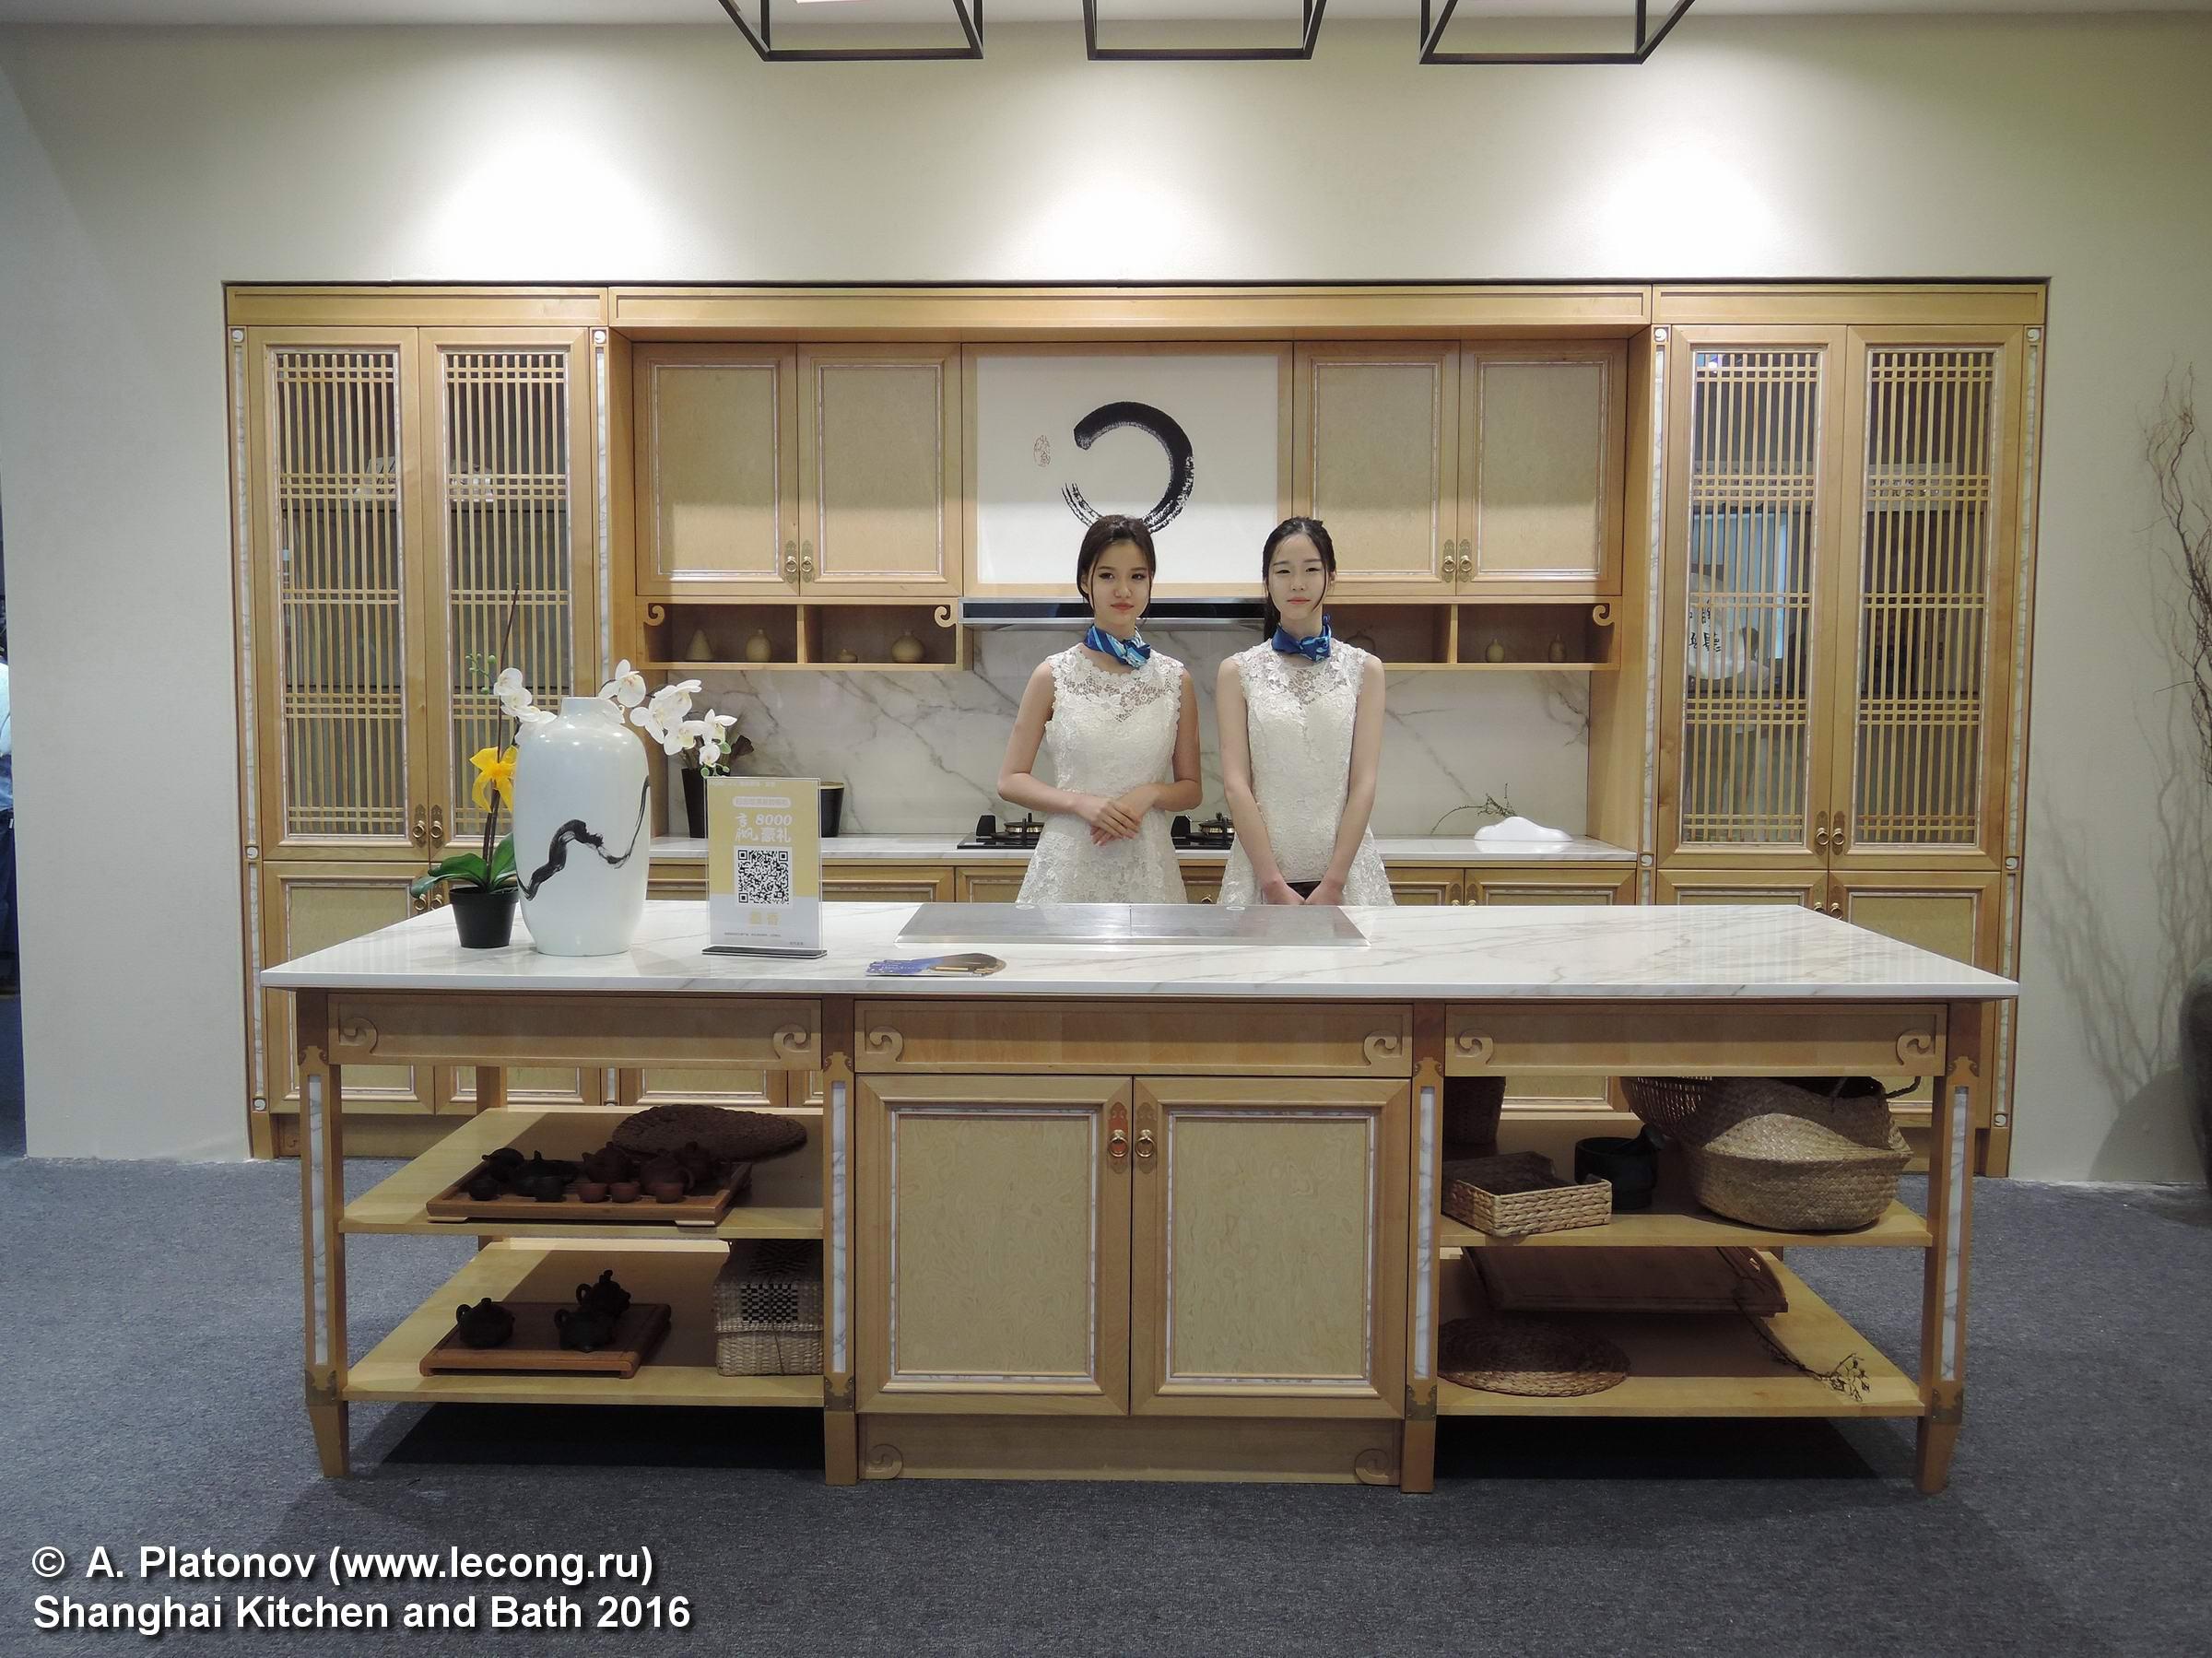 辮竰繿站繿竅繿竄辮箍辮箚辮篌辮箍 shanghai kitchen and bath 2016 lixil haier ri kitchen